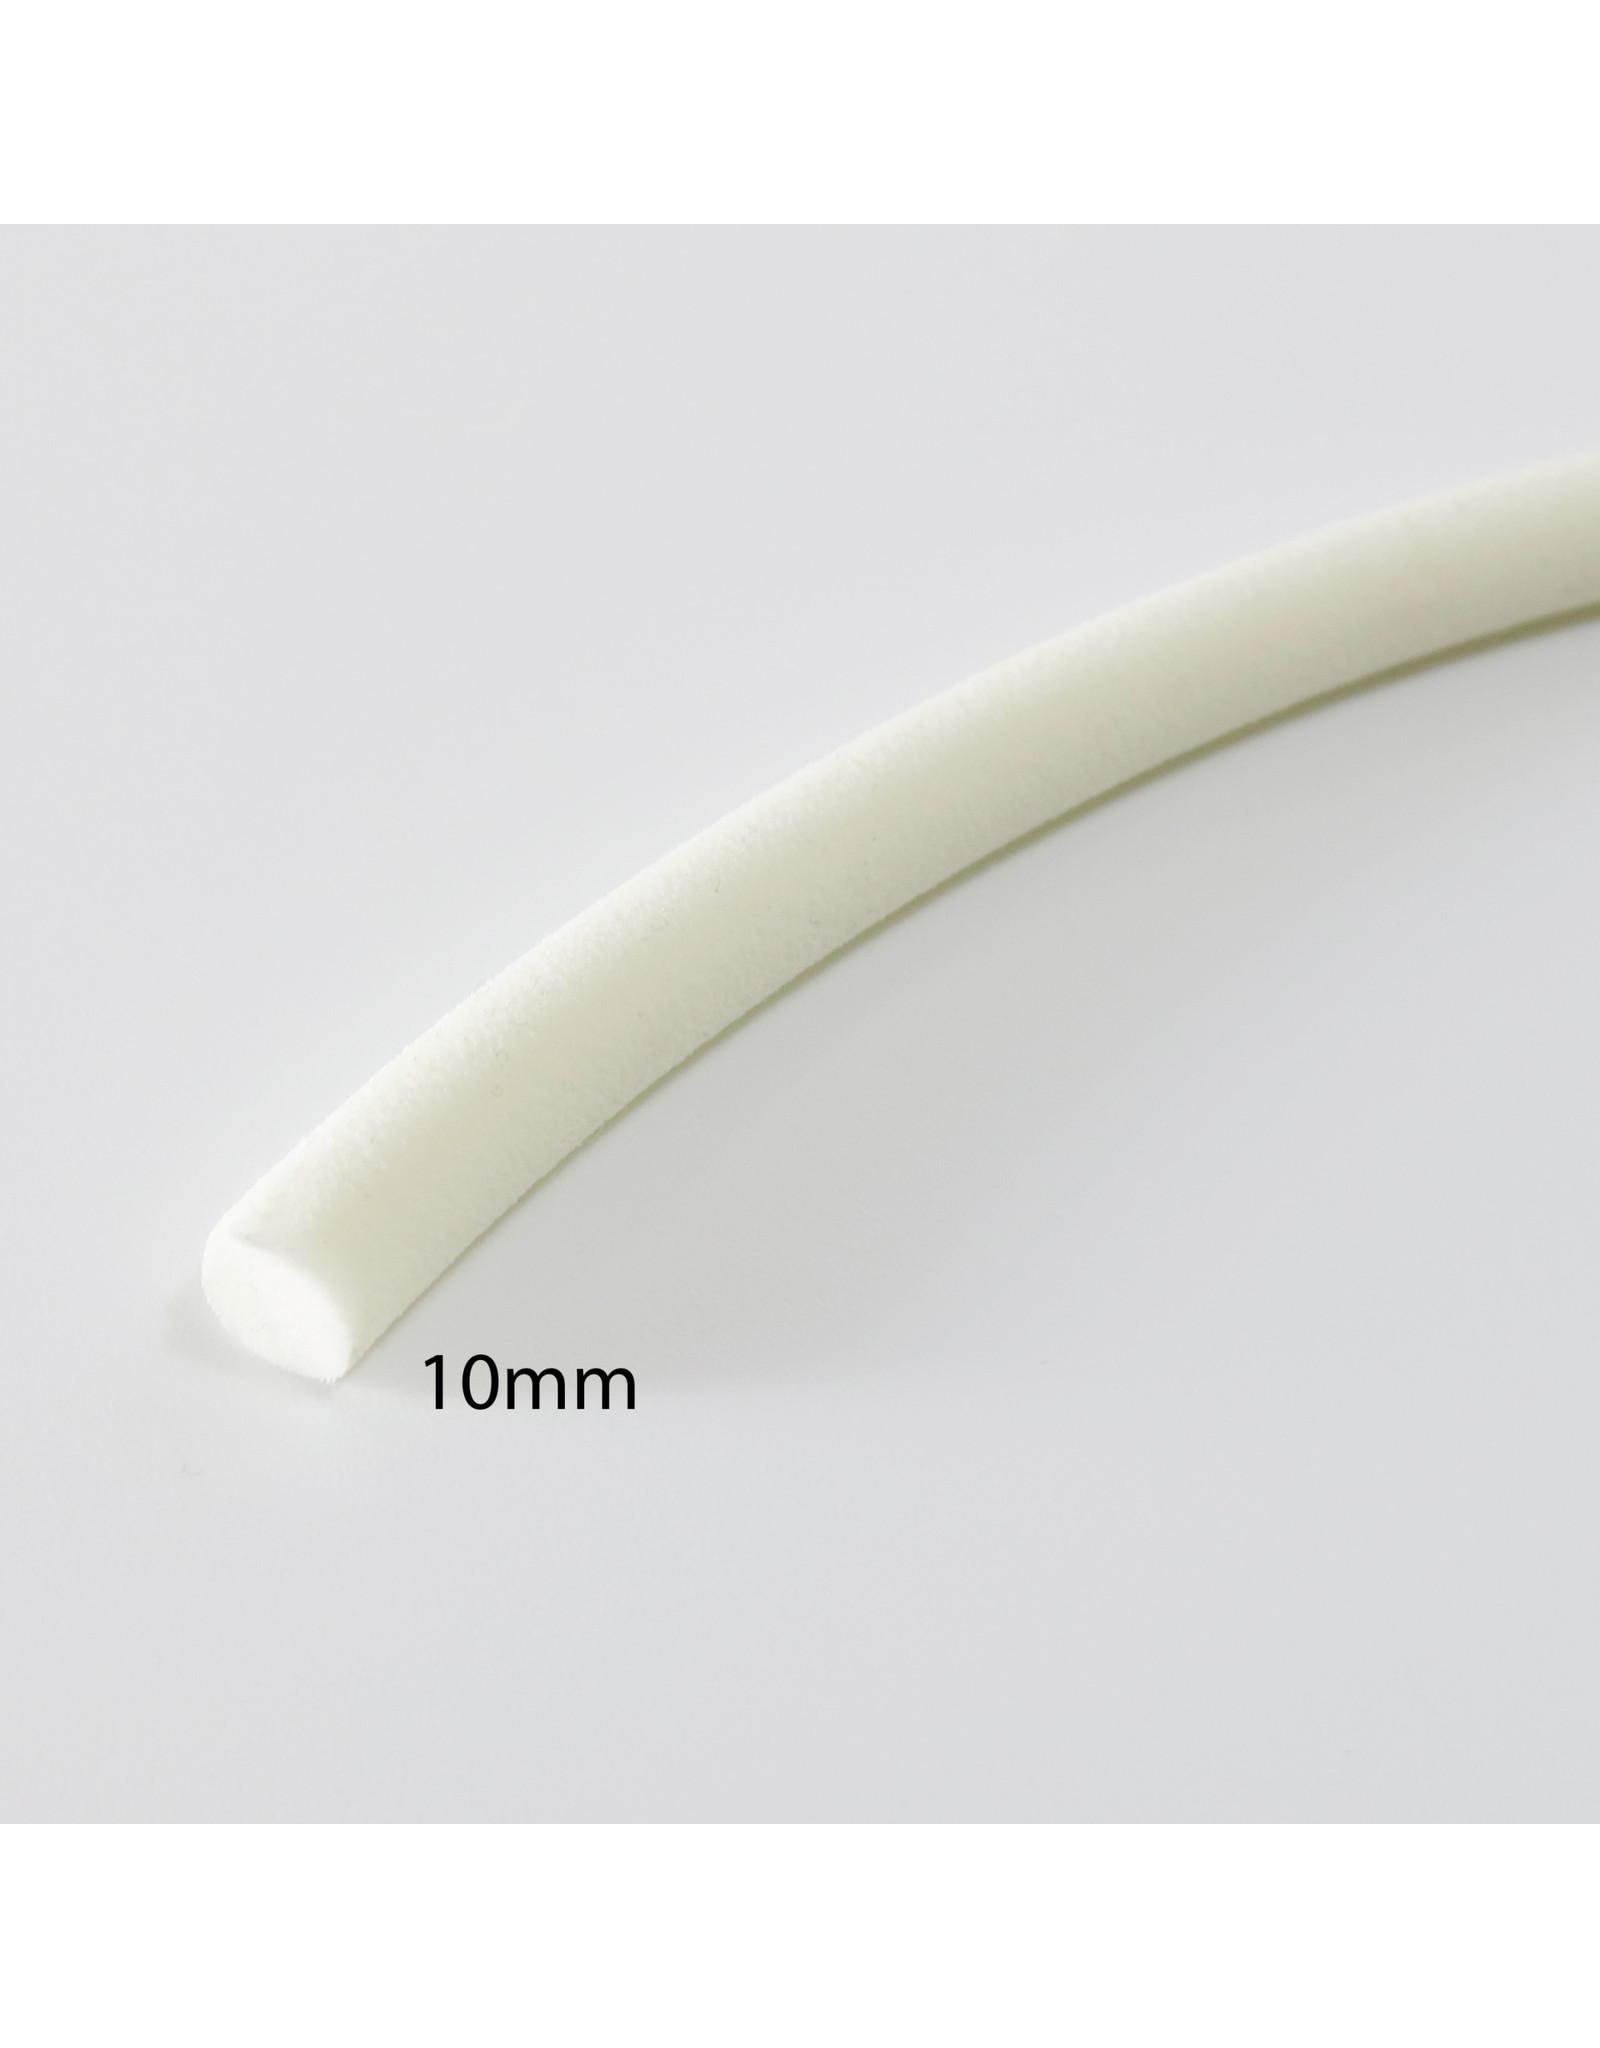 Handle core 10mm